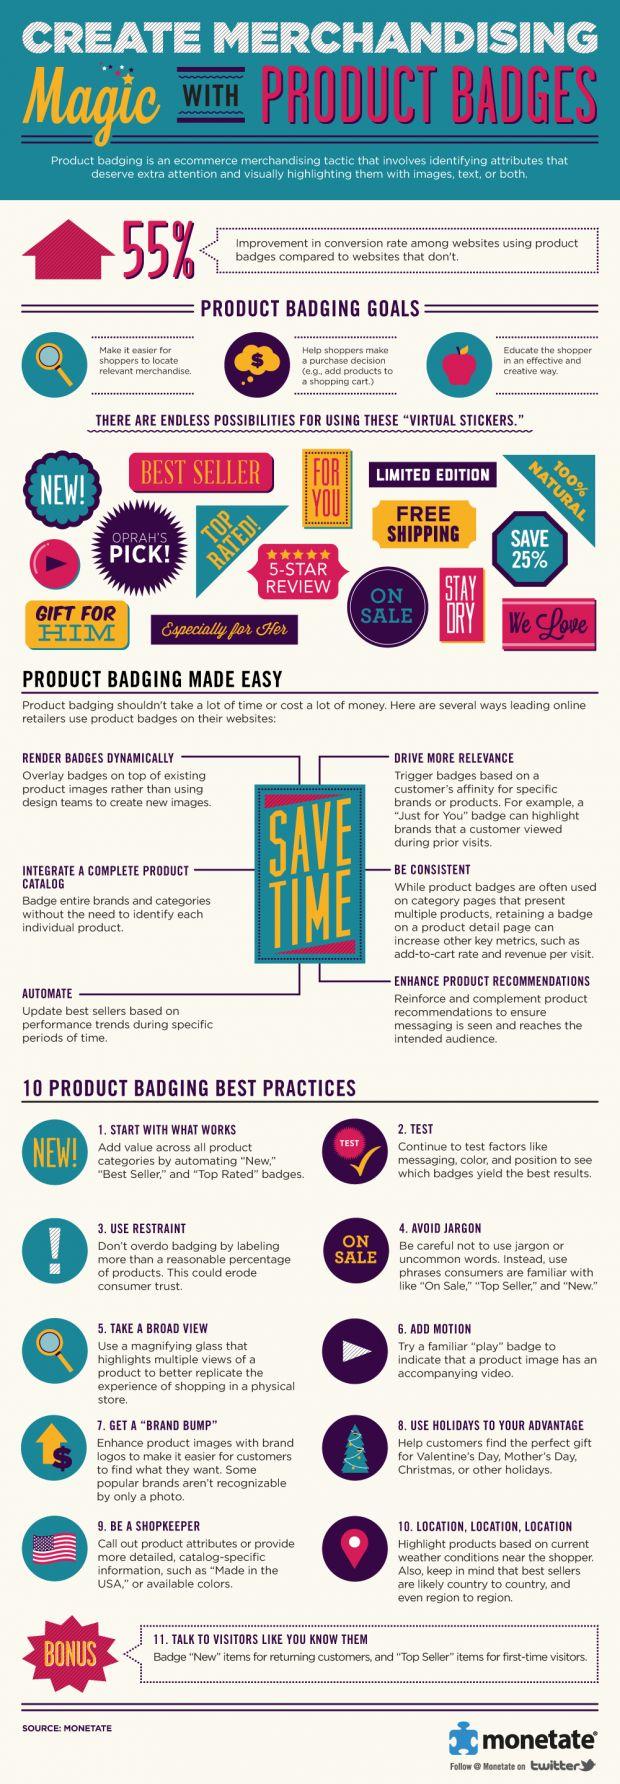 """Create Merchandising Magic with Product Badges"" | Monetate #ecommerce #retail"